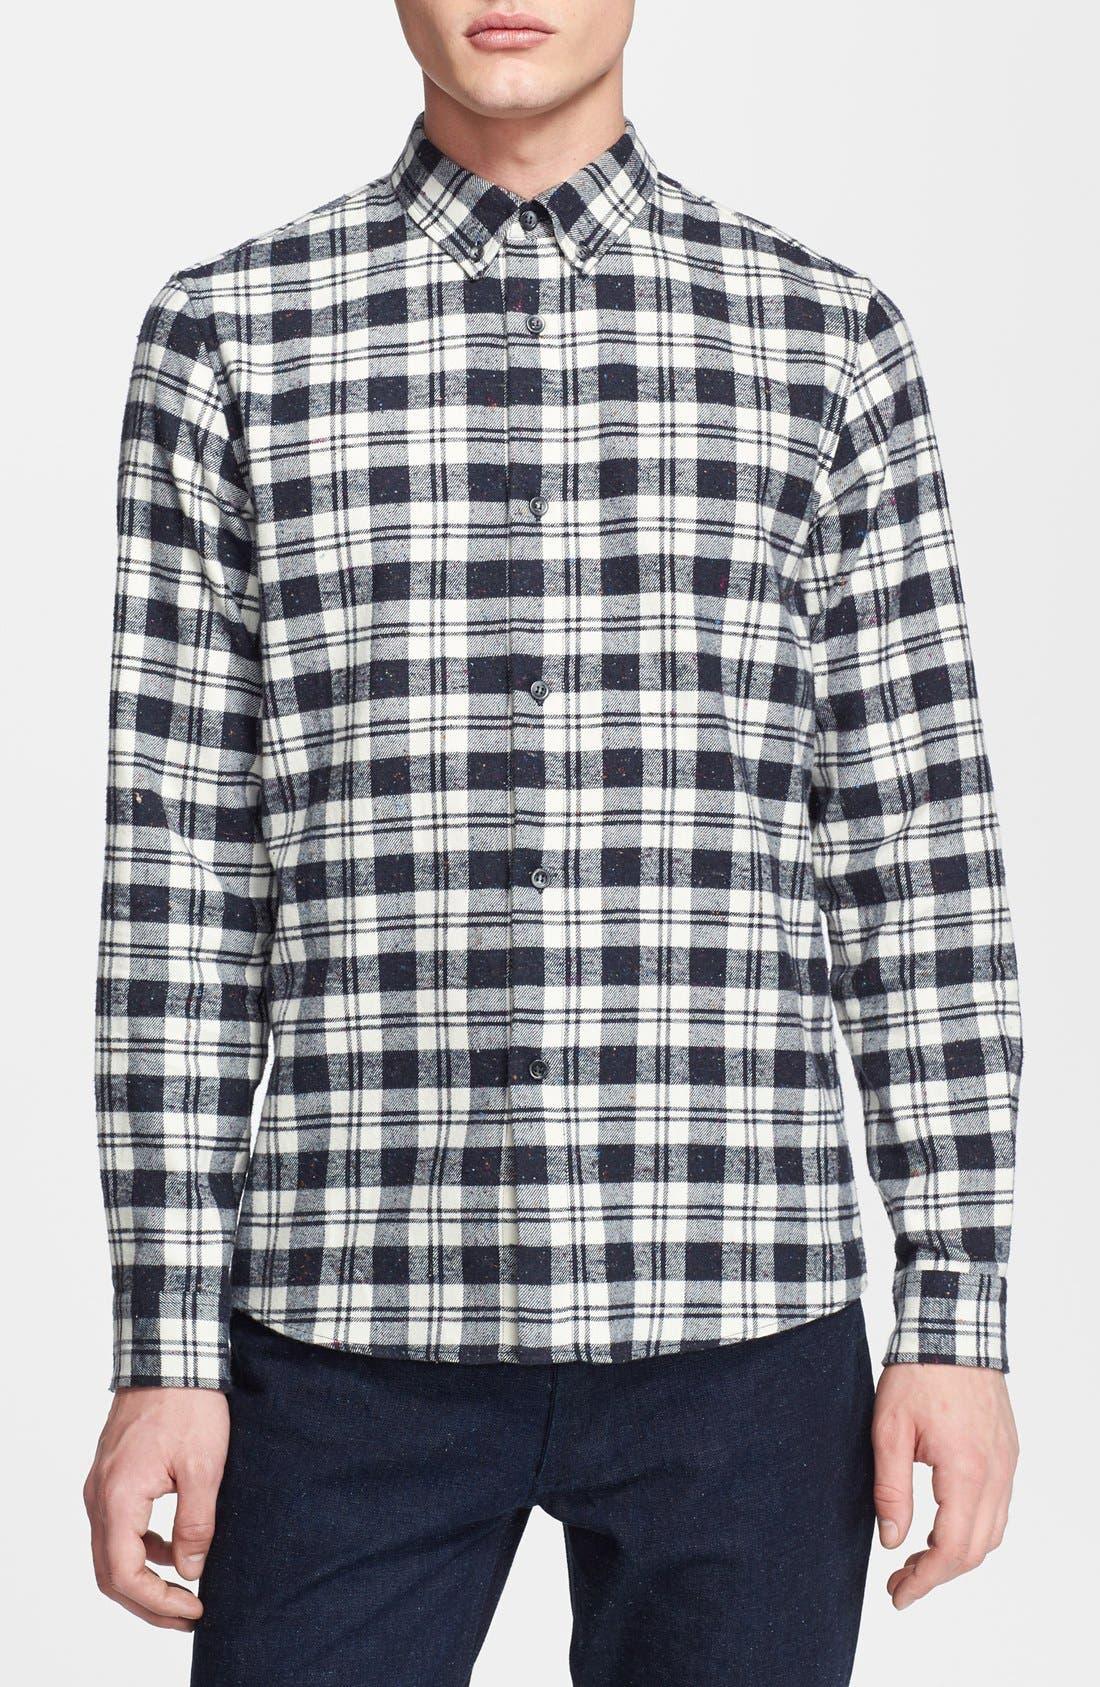 Main Image - A.P.C. Plaid Flannel Shirt